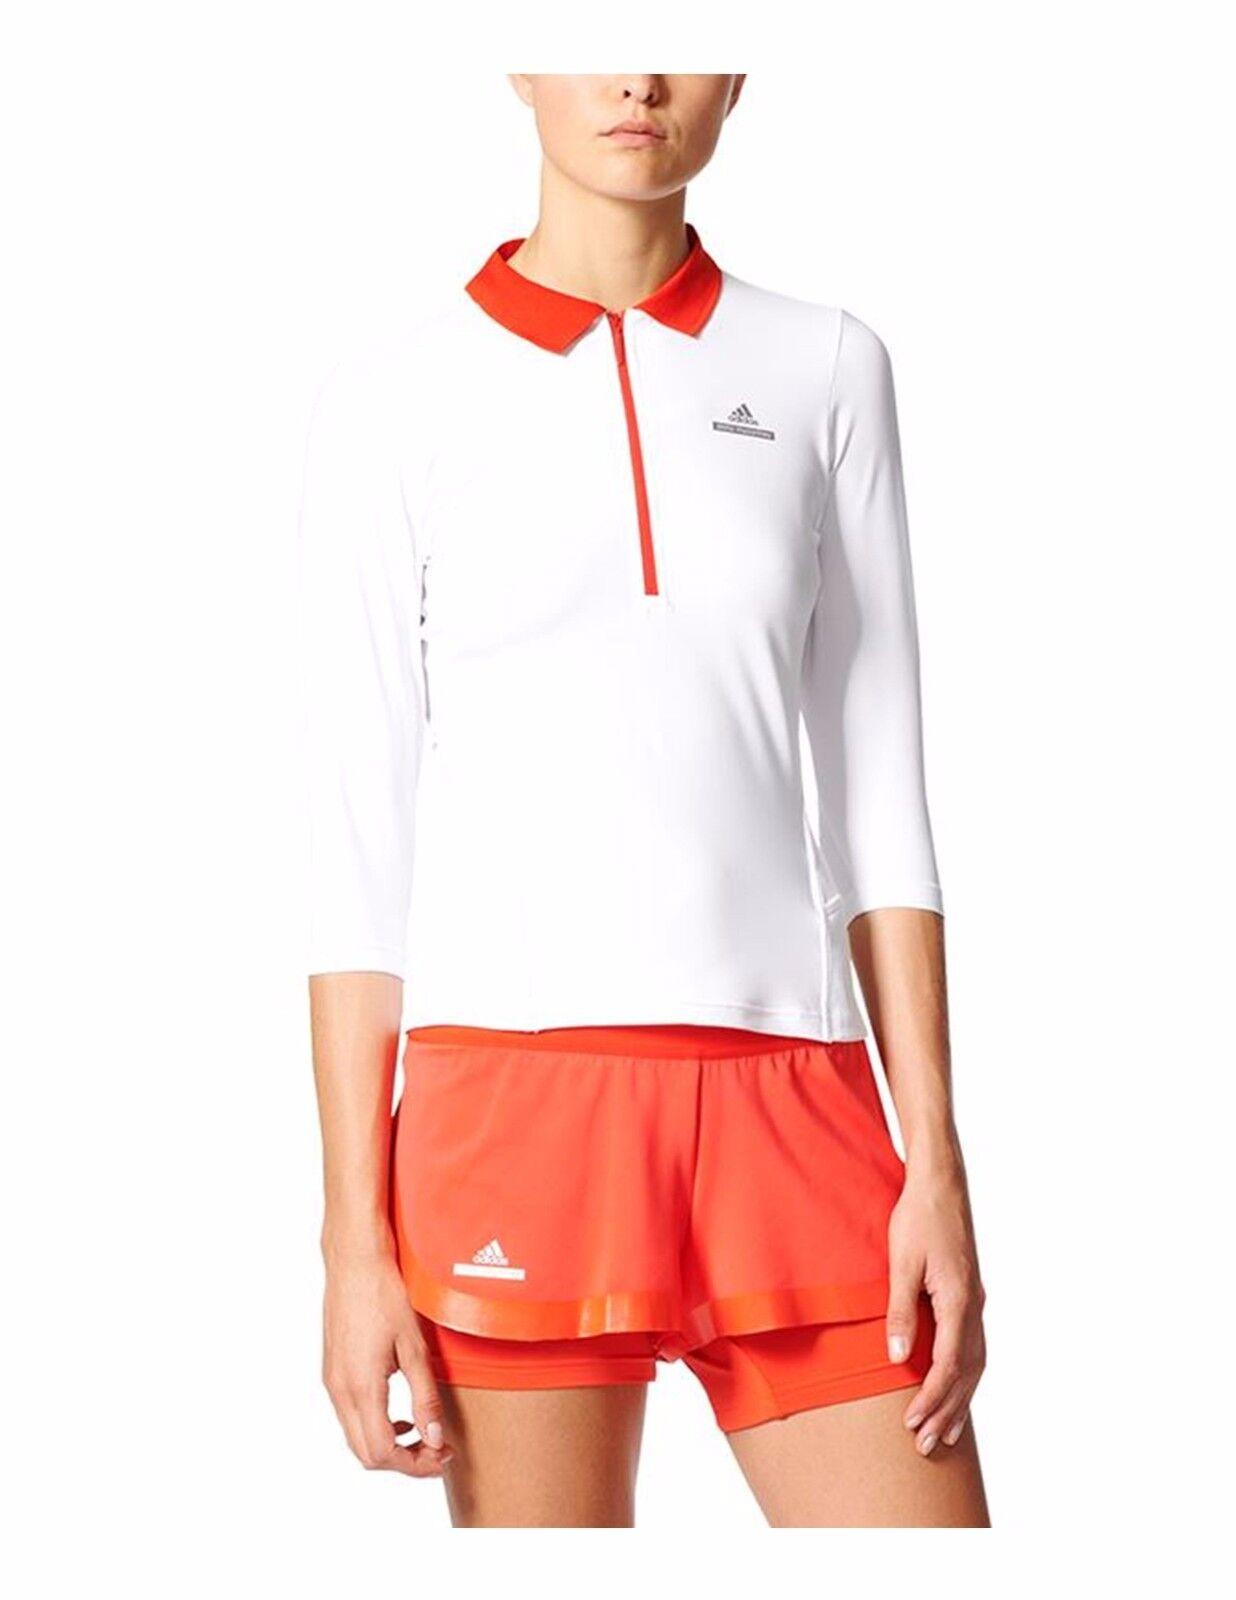 Adidas Stella McCartney 3 4 Sleeve Top